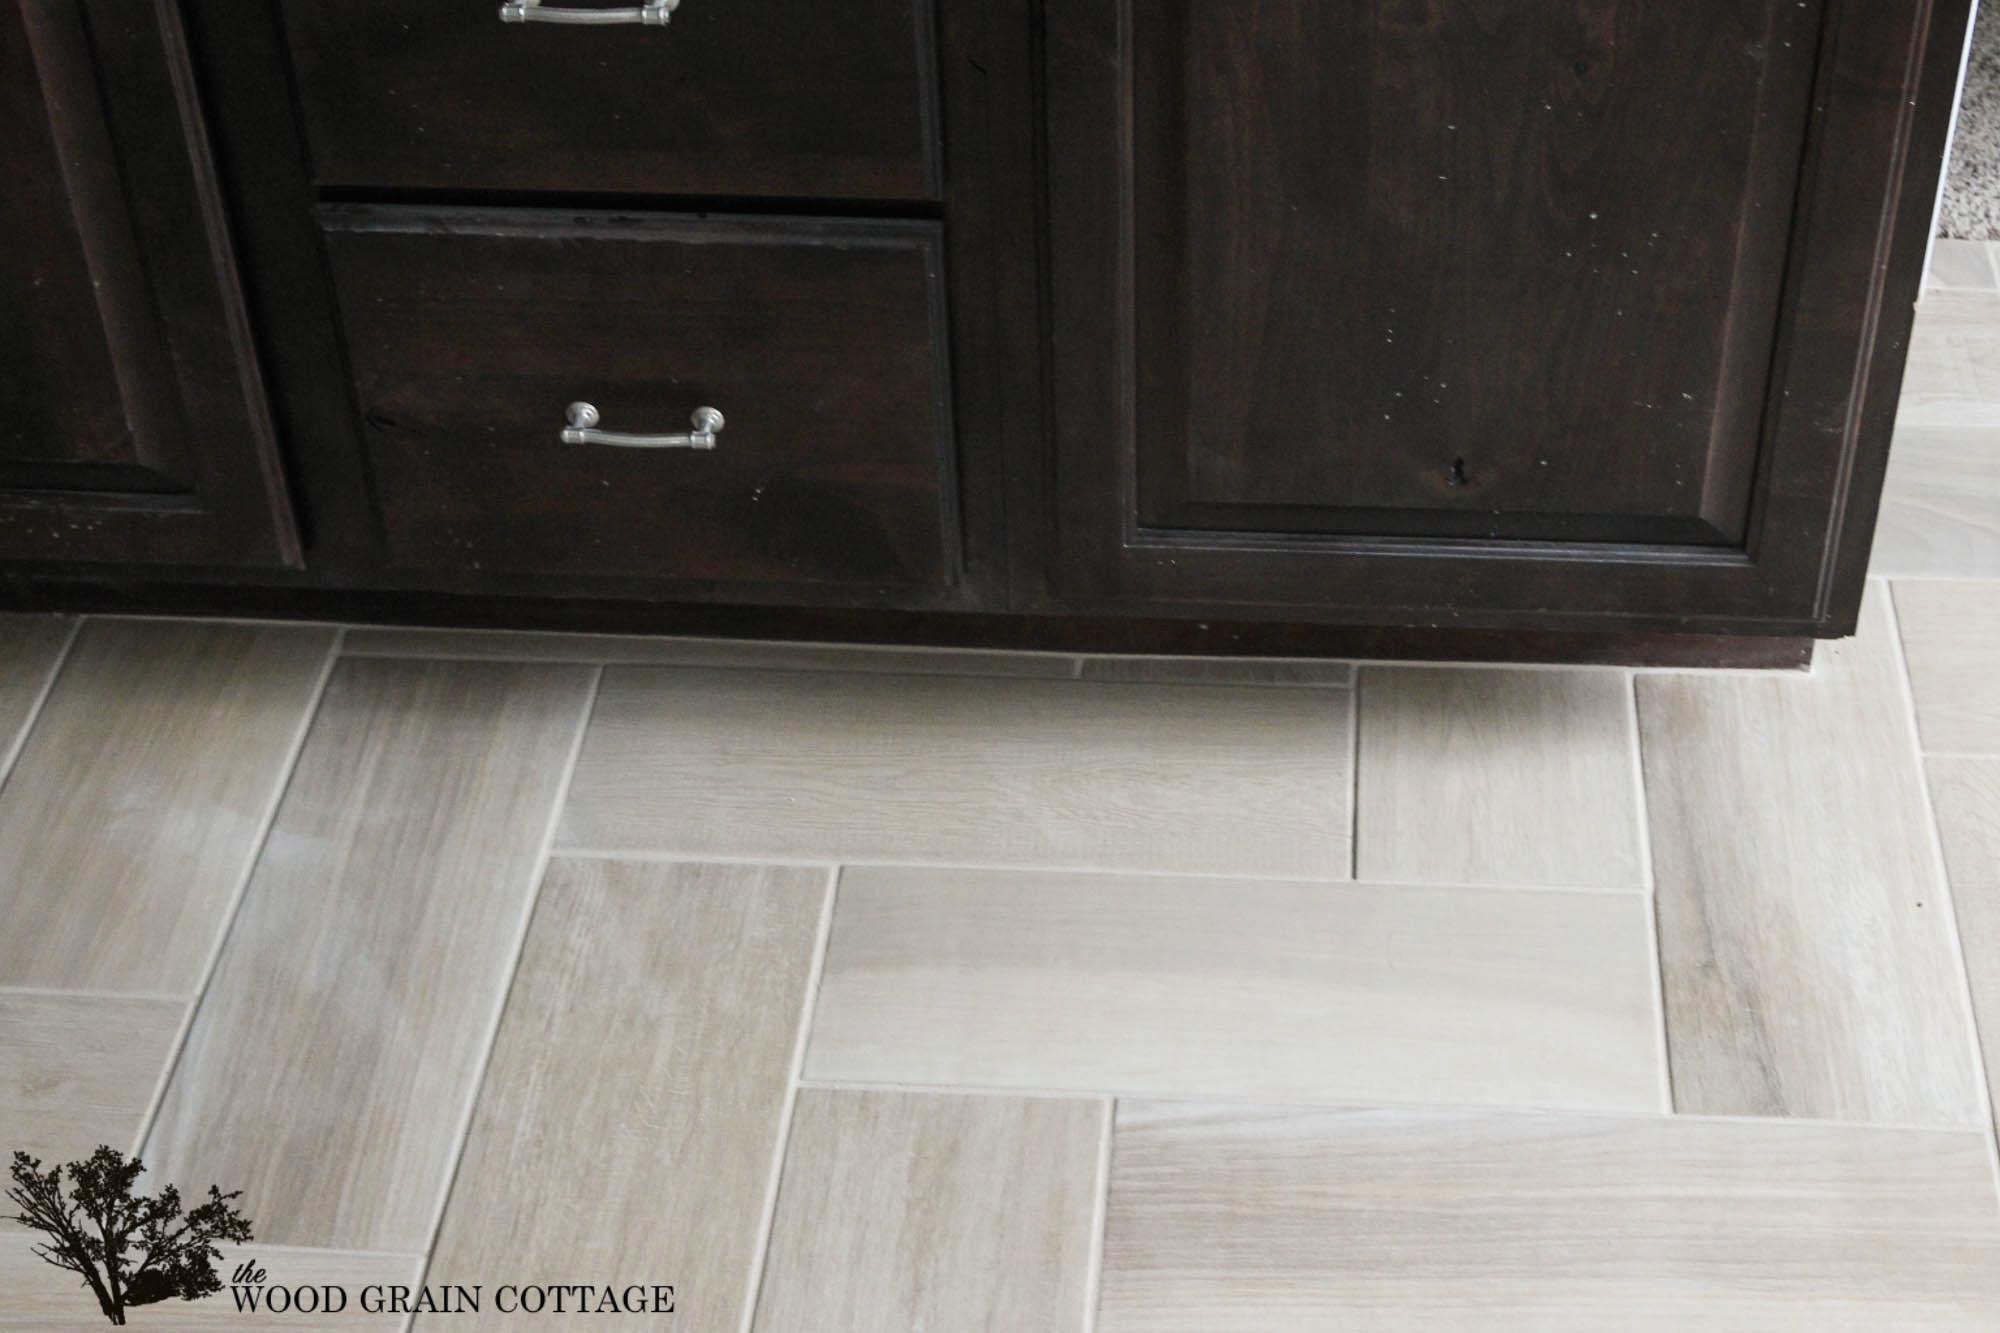 home depot hardwood flooring clearance of homedepot laminate flooring easylinke com within homedepot laminate flooring luxury home design photo to home interior ideas of homedepot laminate flooring